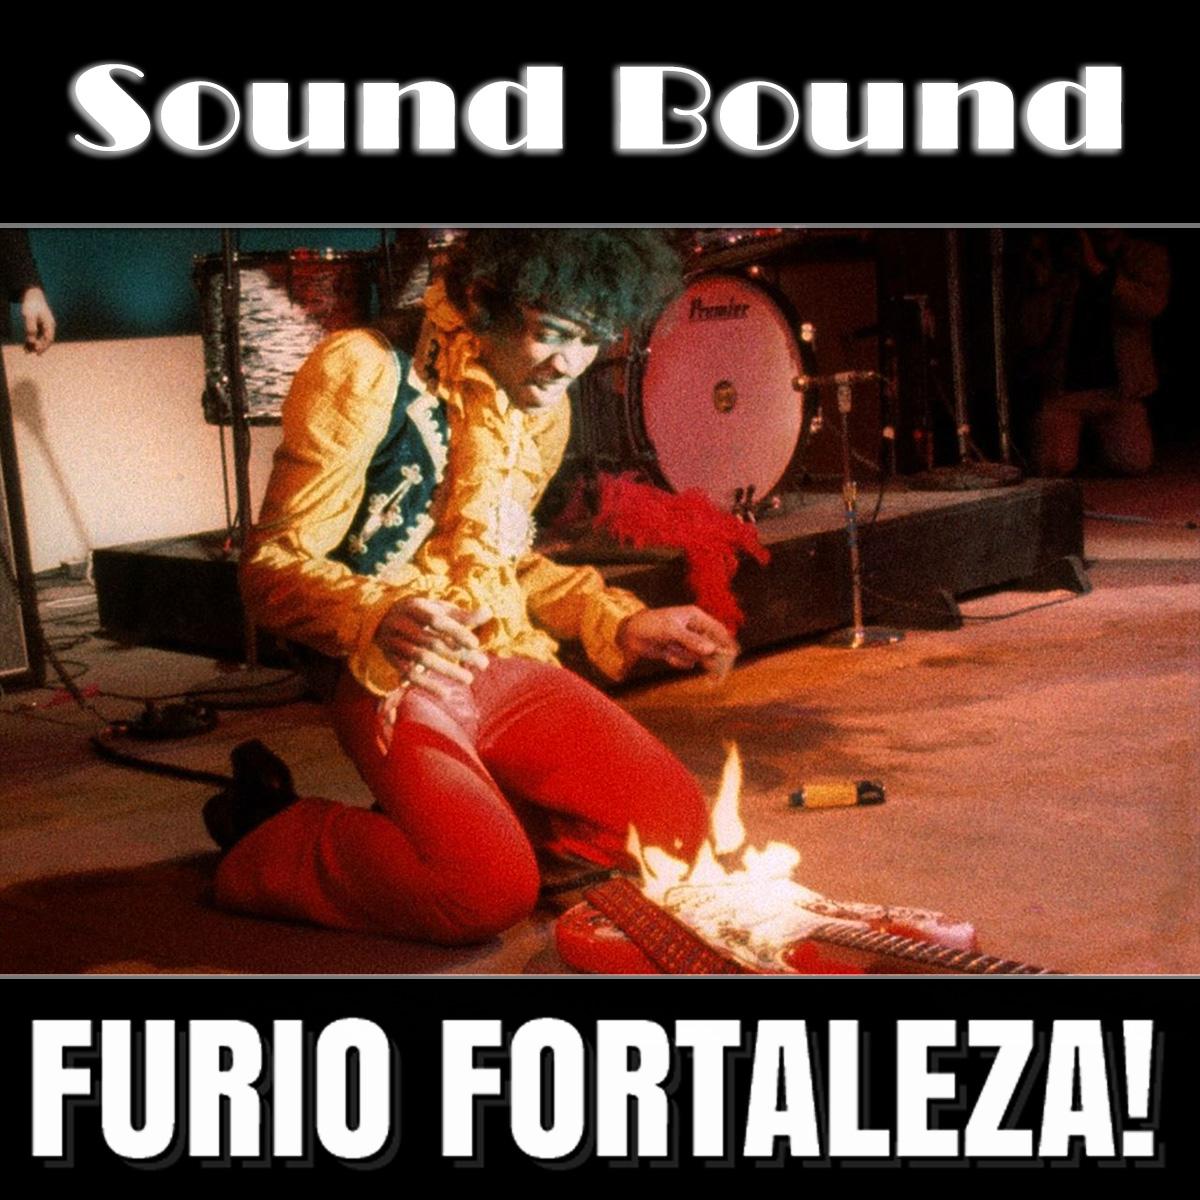 Furio Fortaleza! - 5.2 - Sound Bound